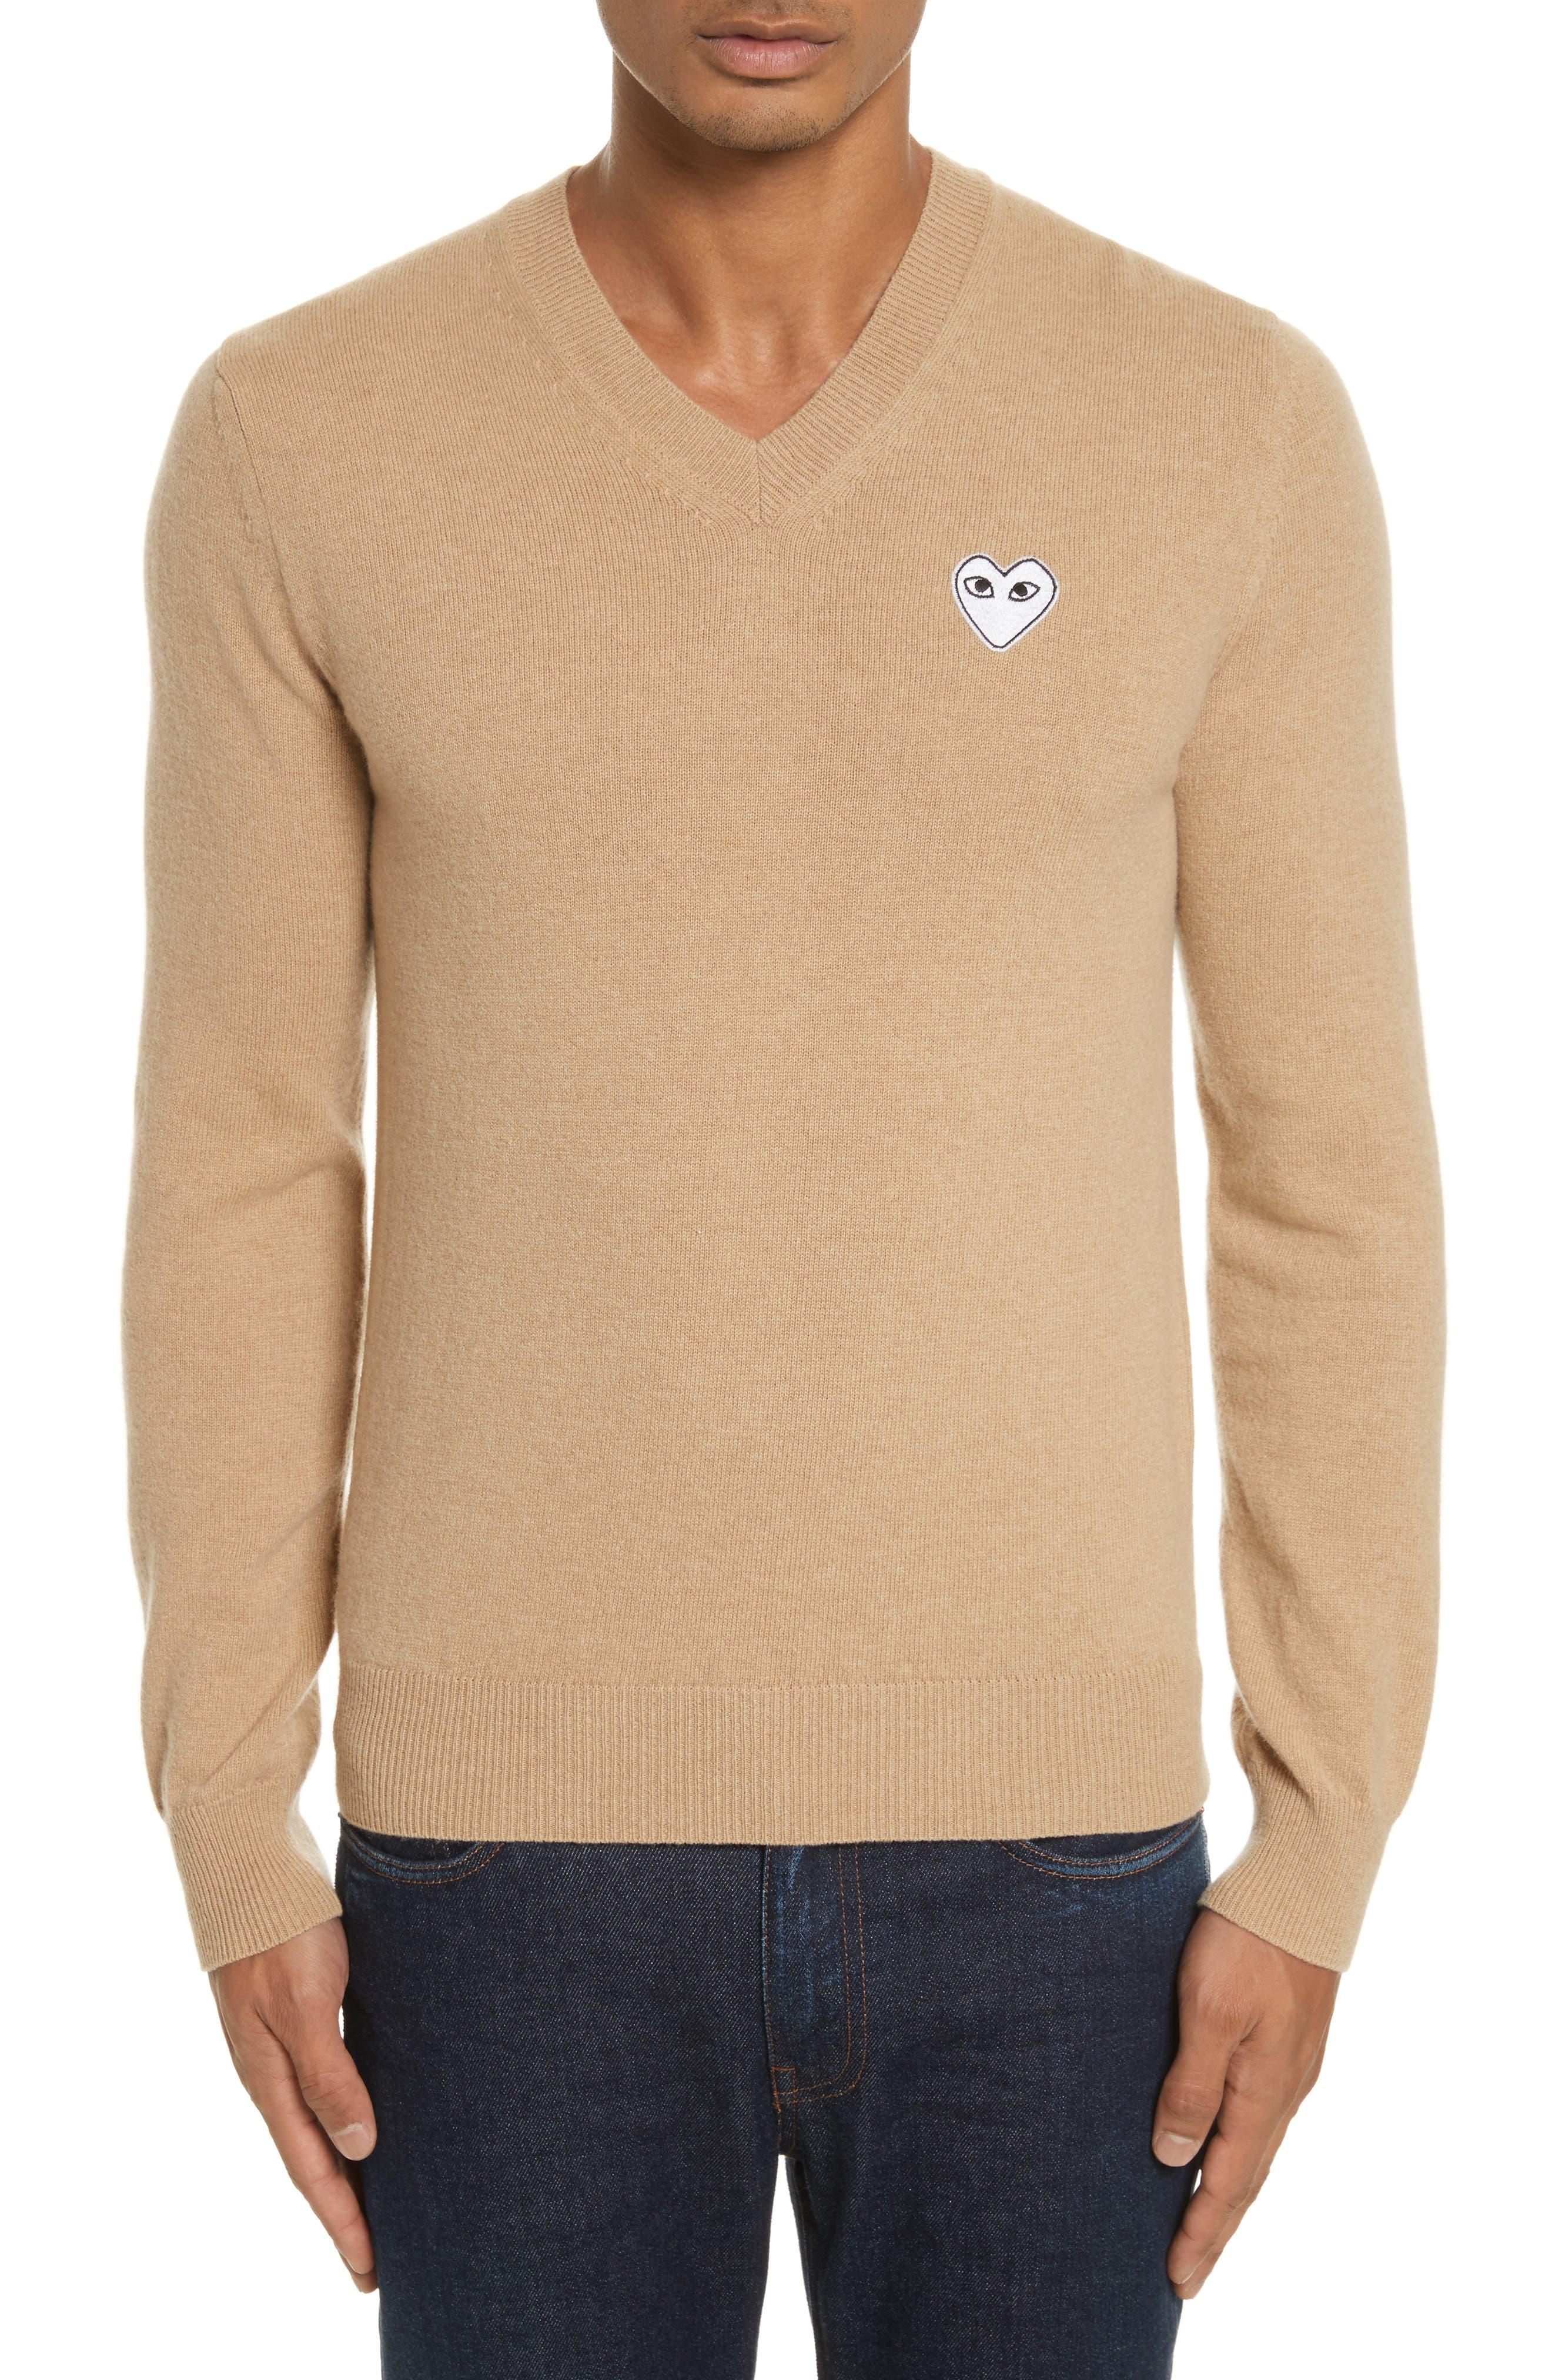 Main Image - Comme des Garçons PLAY White Heart Wool V-Neck Sweater